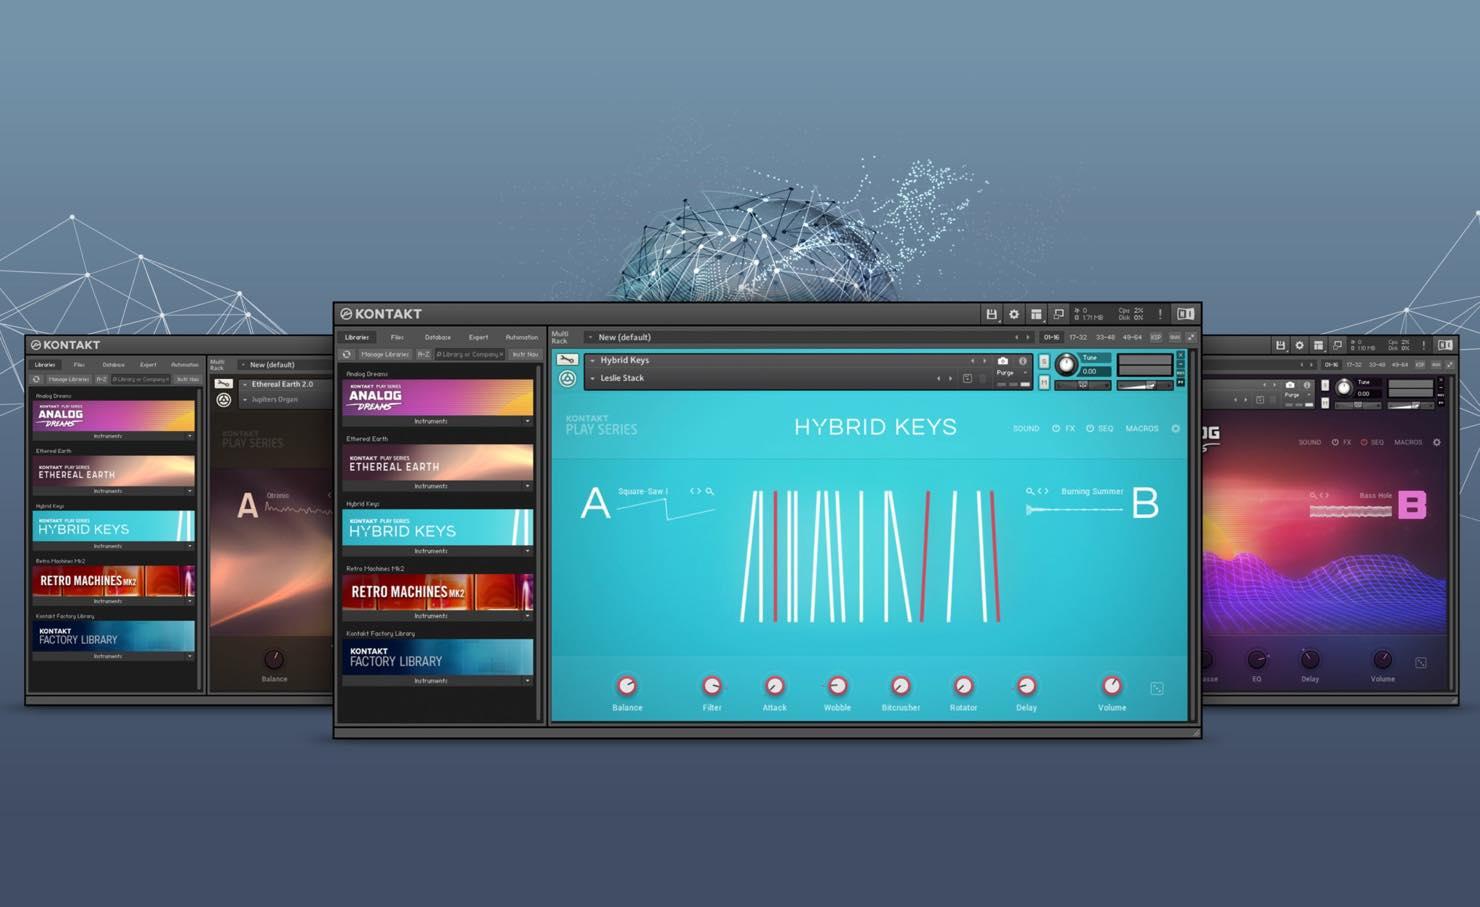 【50%OFF】Native Instruments 業界標準サンプラー「KONTAKT 6」がセール中!